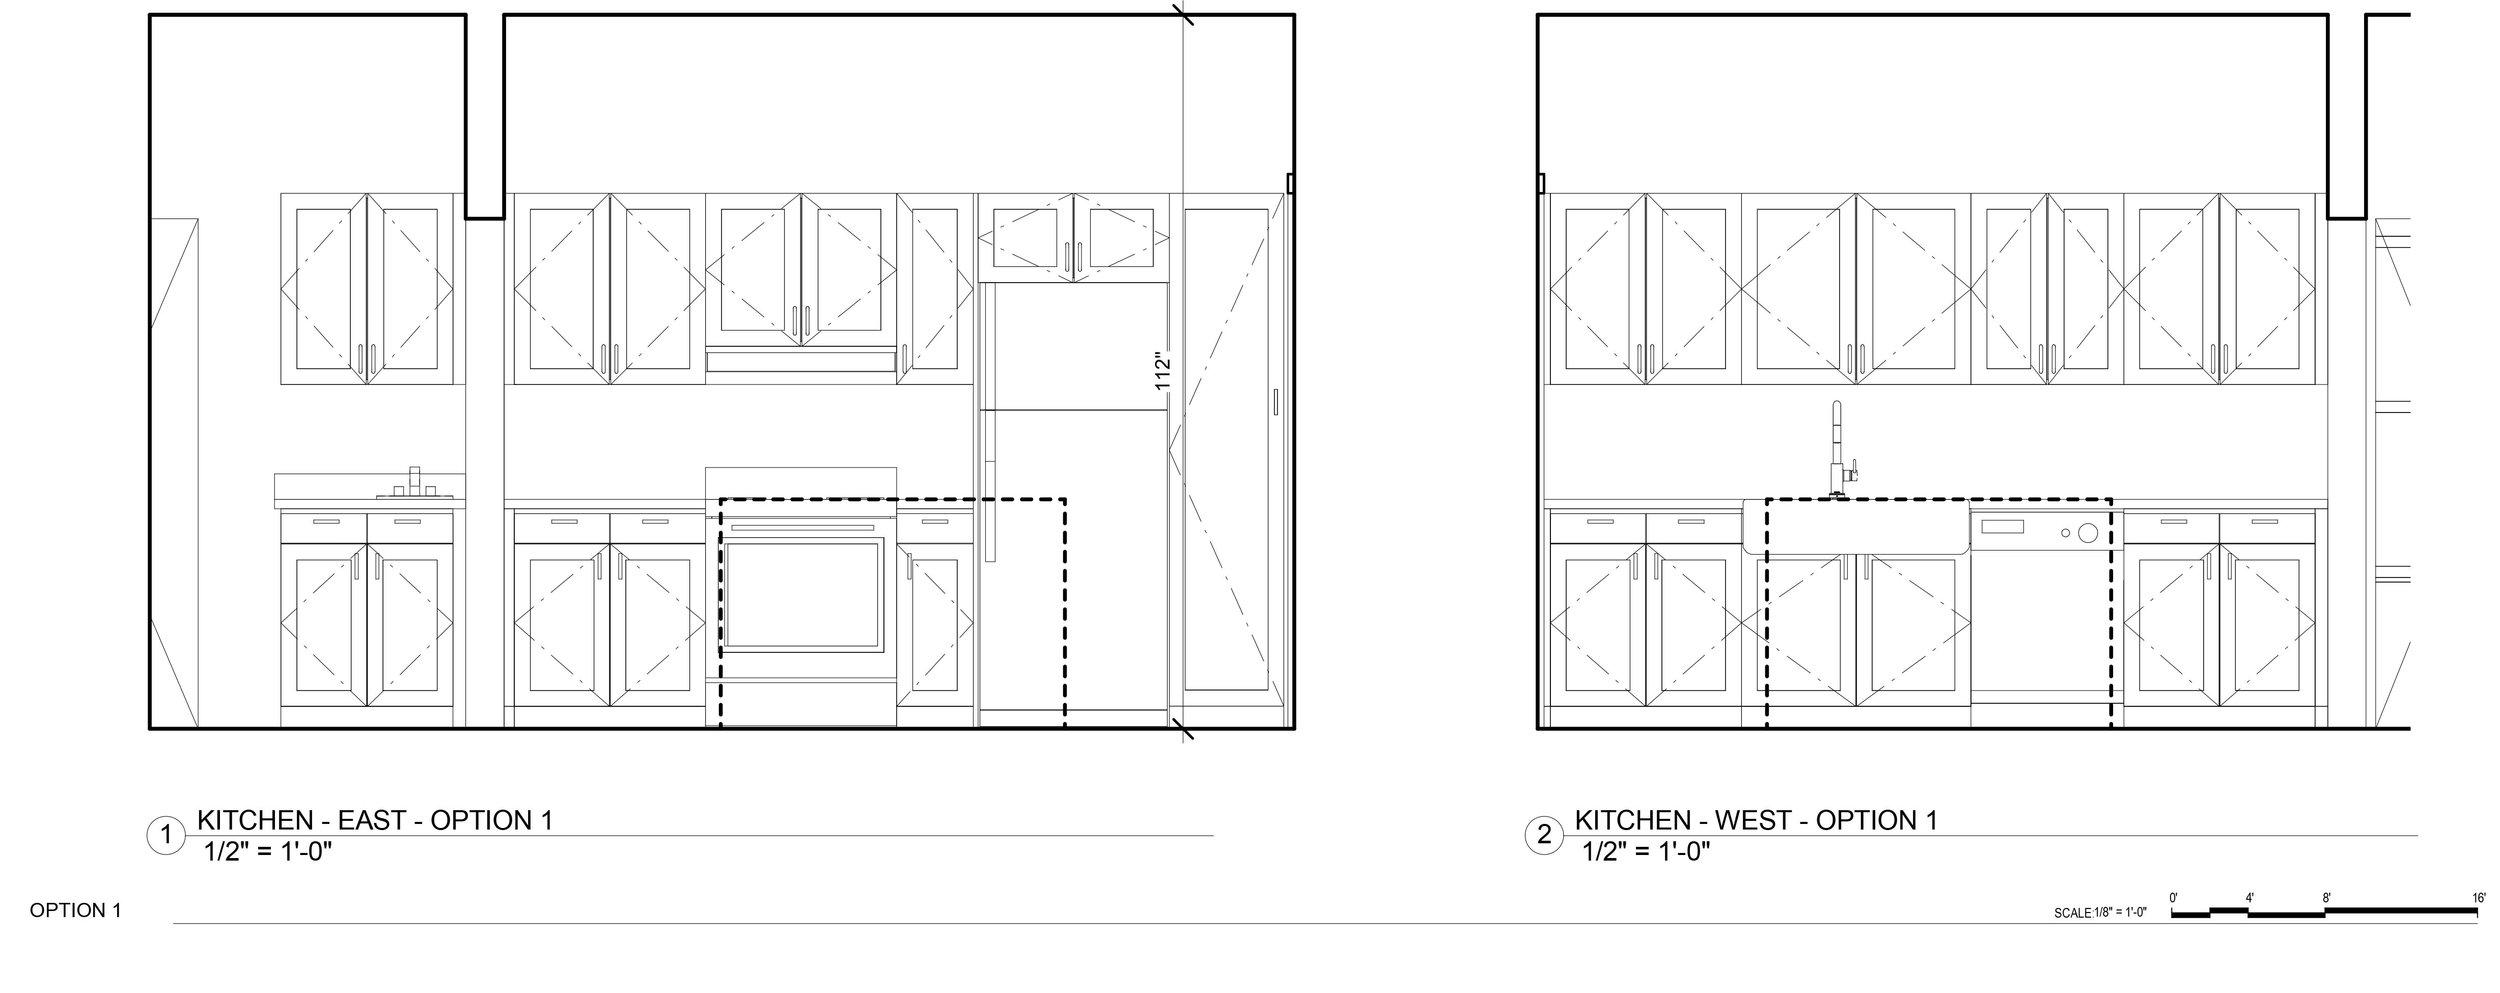 Kitchen remodel idea - Elevations